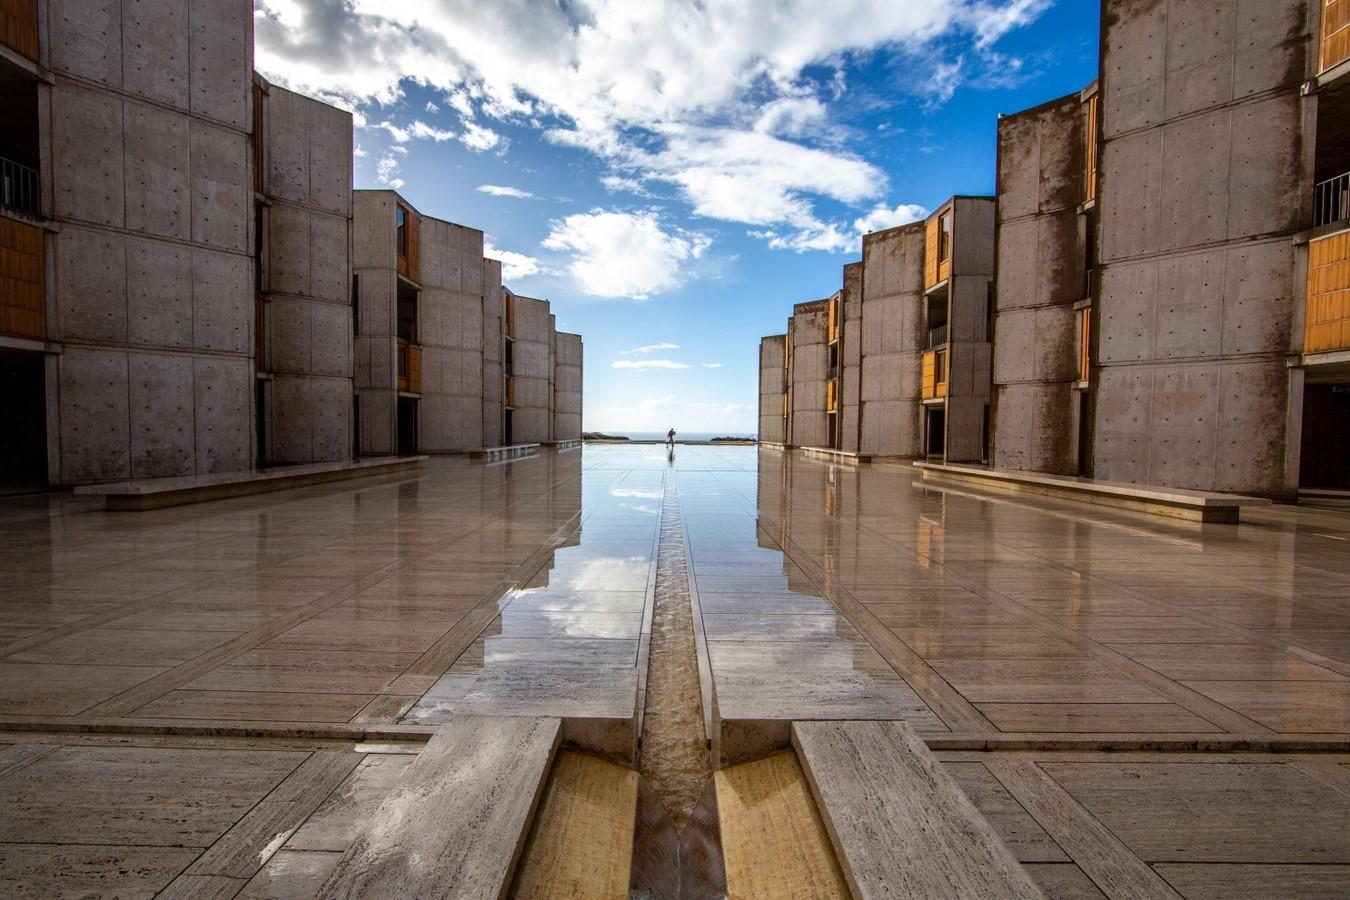 Salk Institute for Biological Sciences, San Diego, California, USA by Louis Kahn - Sheet1